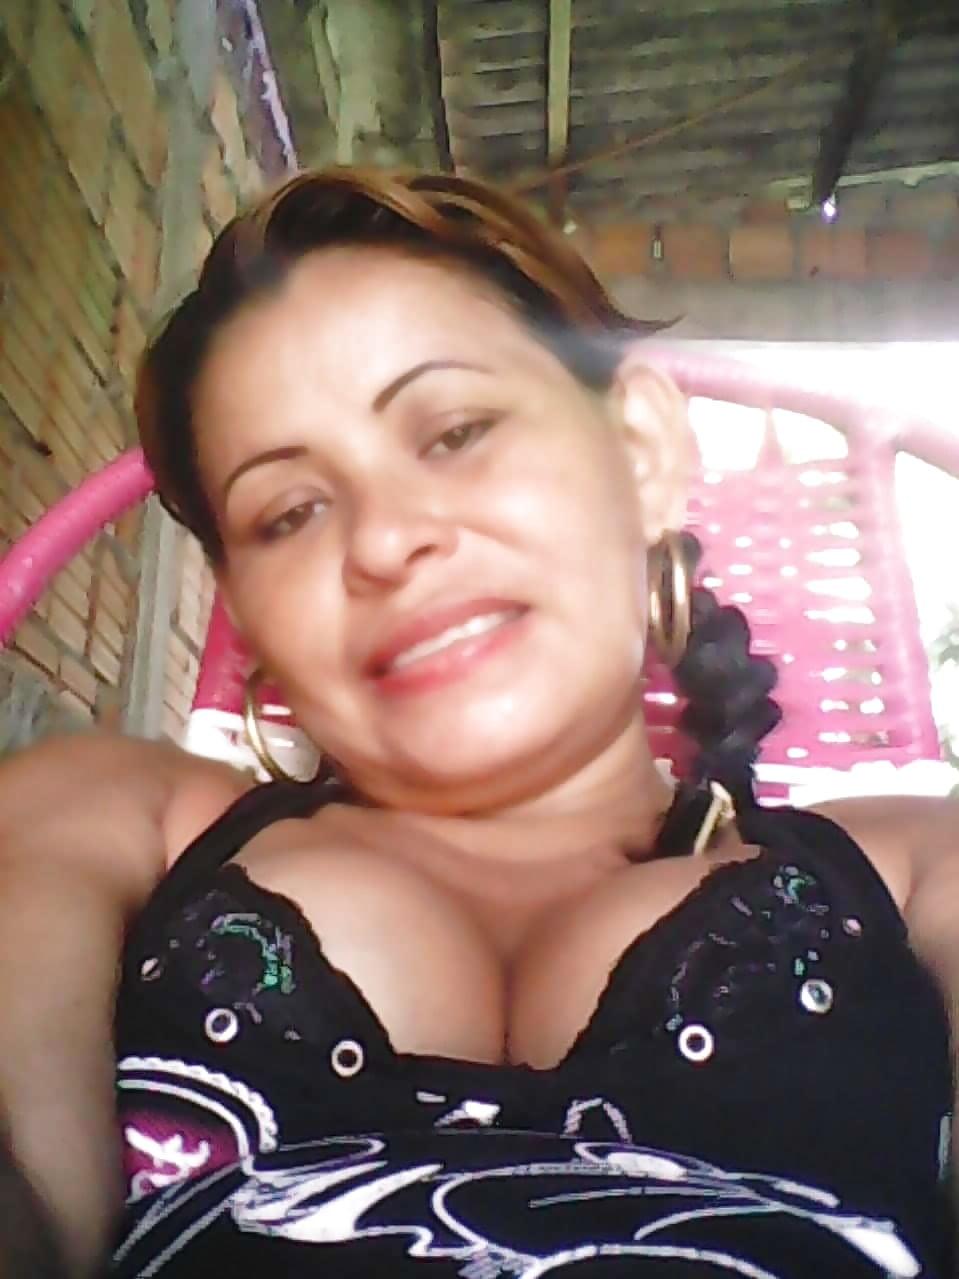 Big boobs mom sex porn-5512